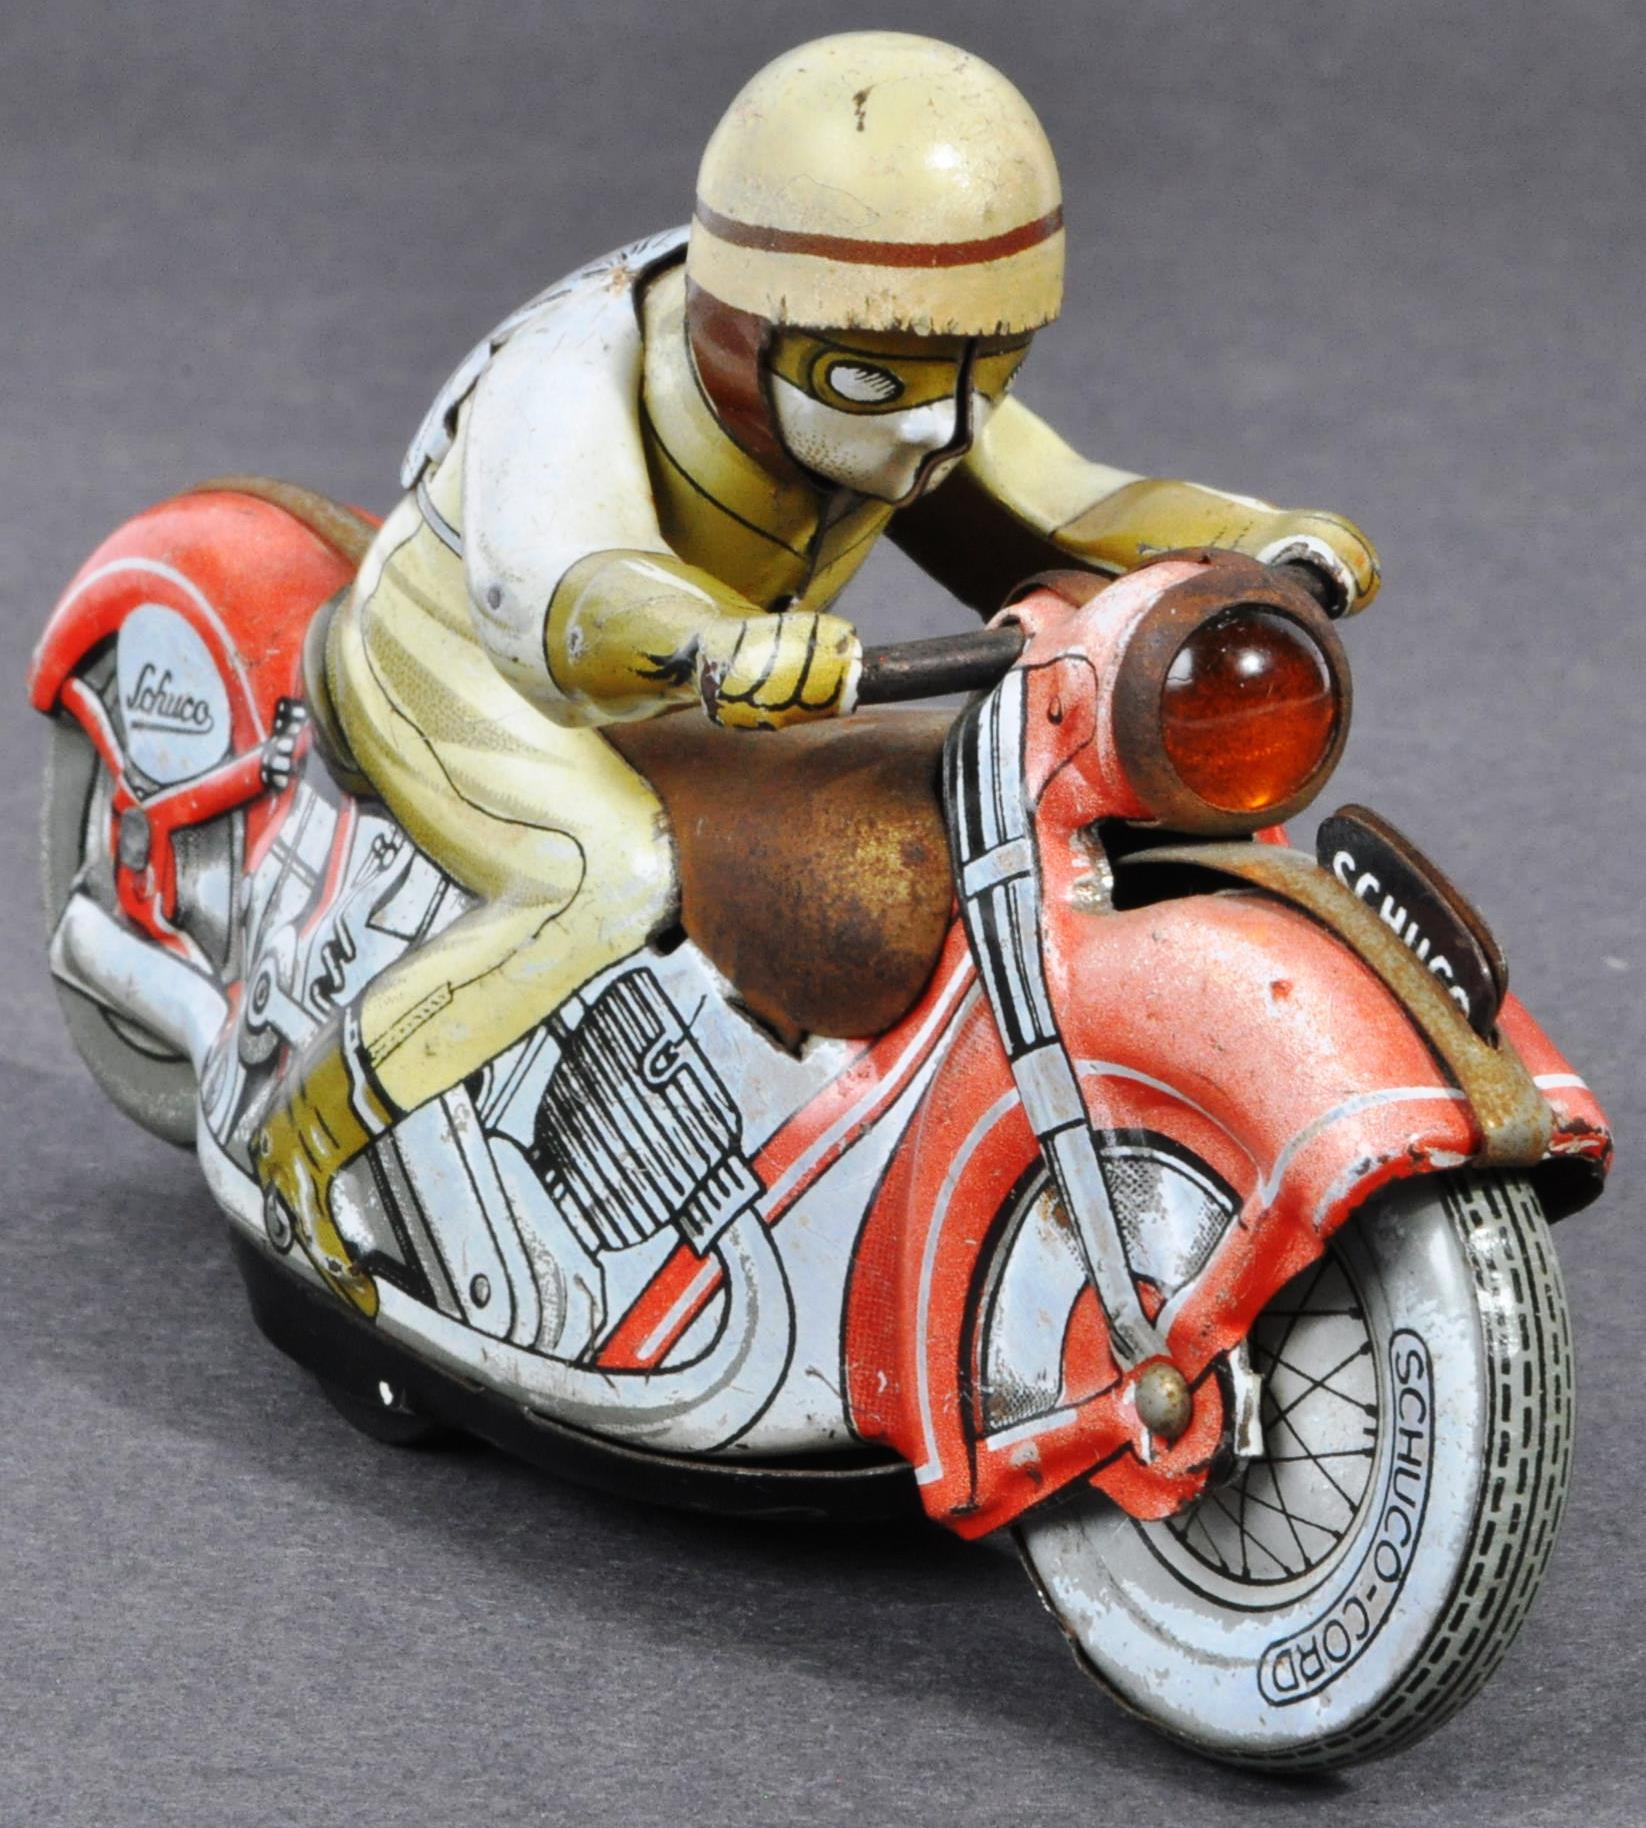 ORIGINAL VINTAGE SCHUCO TINPLATE RACING MOTORCYCLE - Image 3 of 8